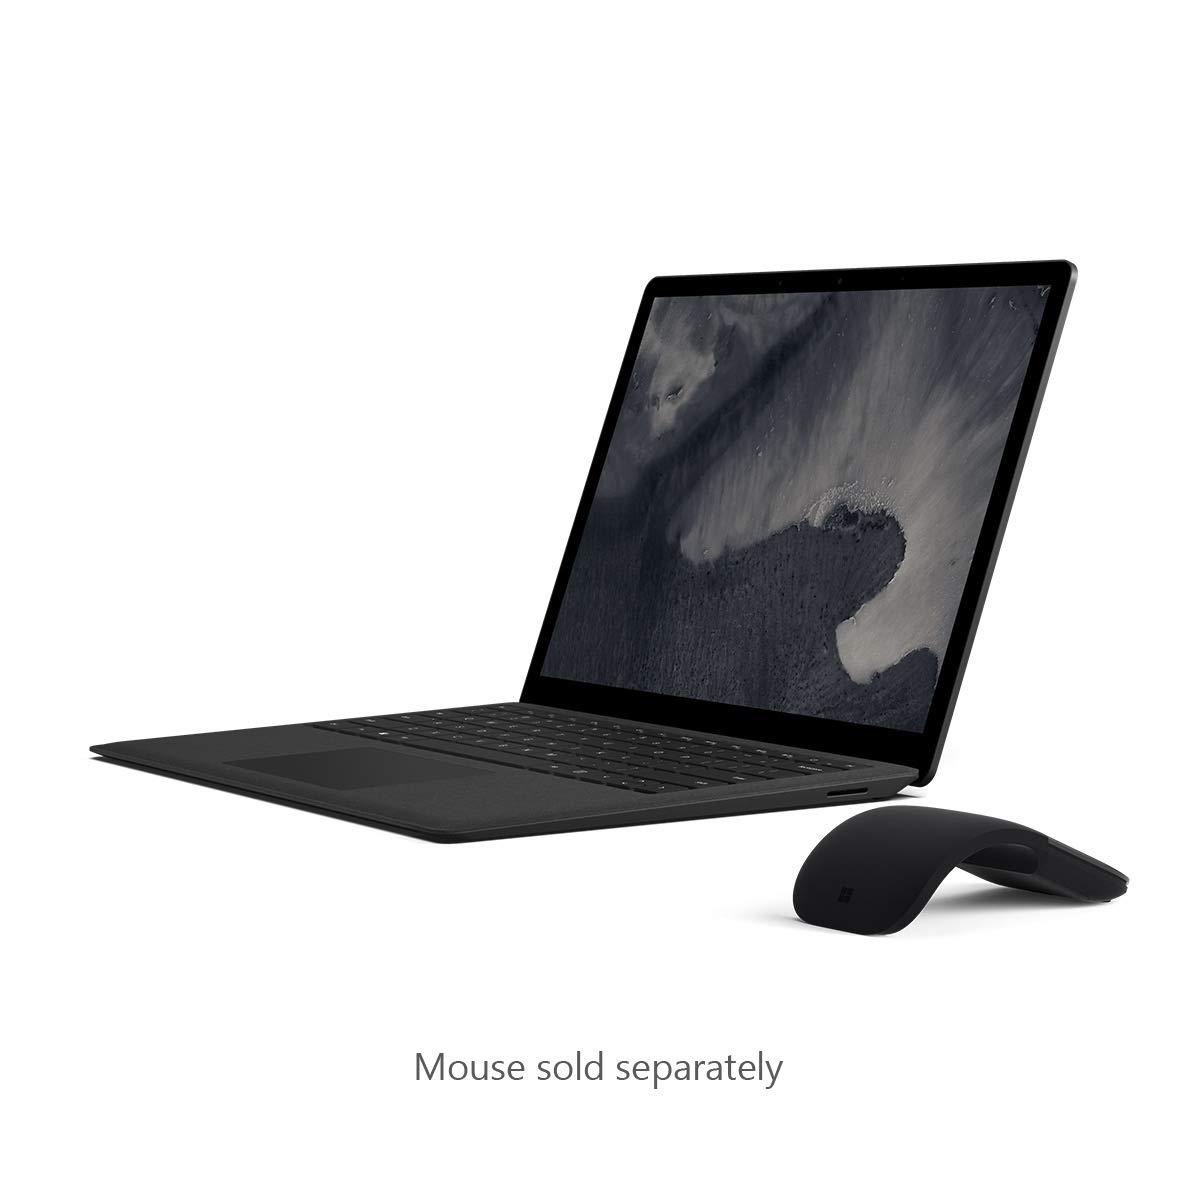 Microsoft Surface Laptop 2 (Intel Core i5, 8GB RAM, 128GB) – Platinum